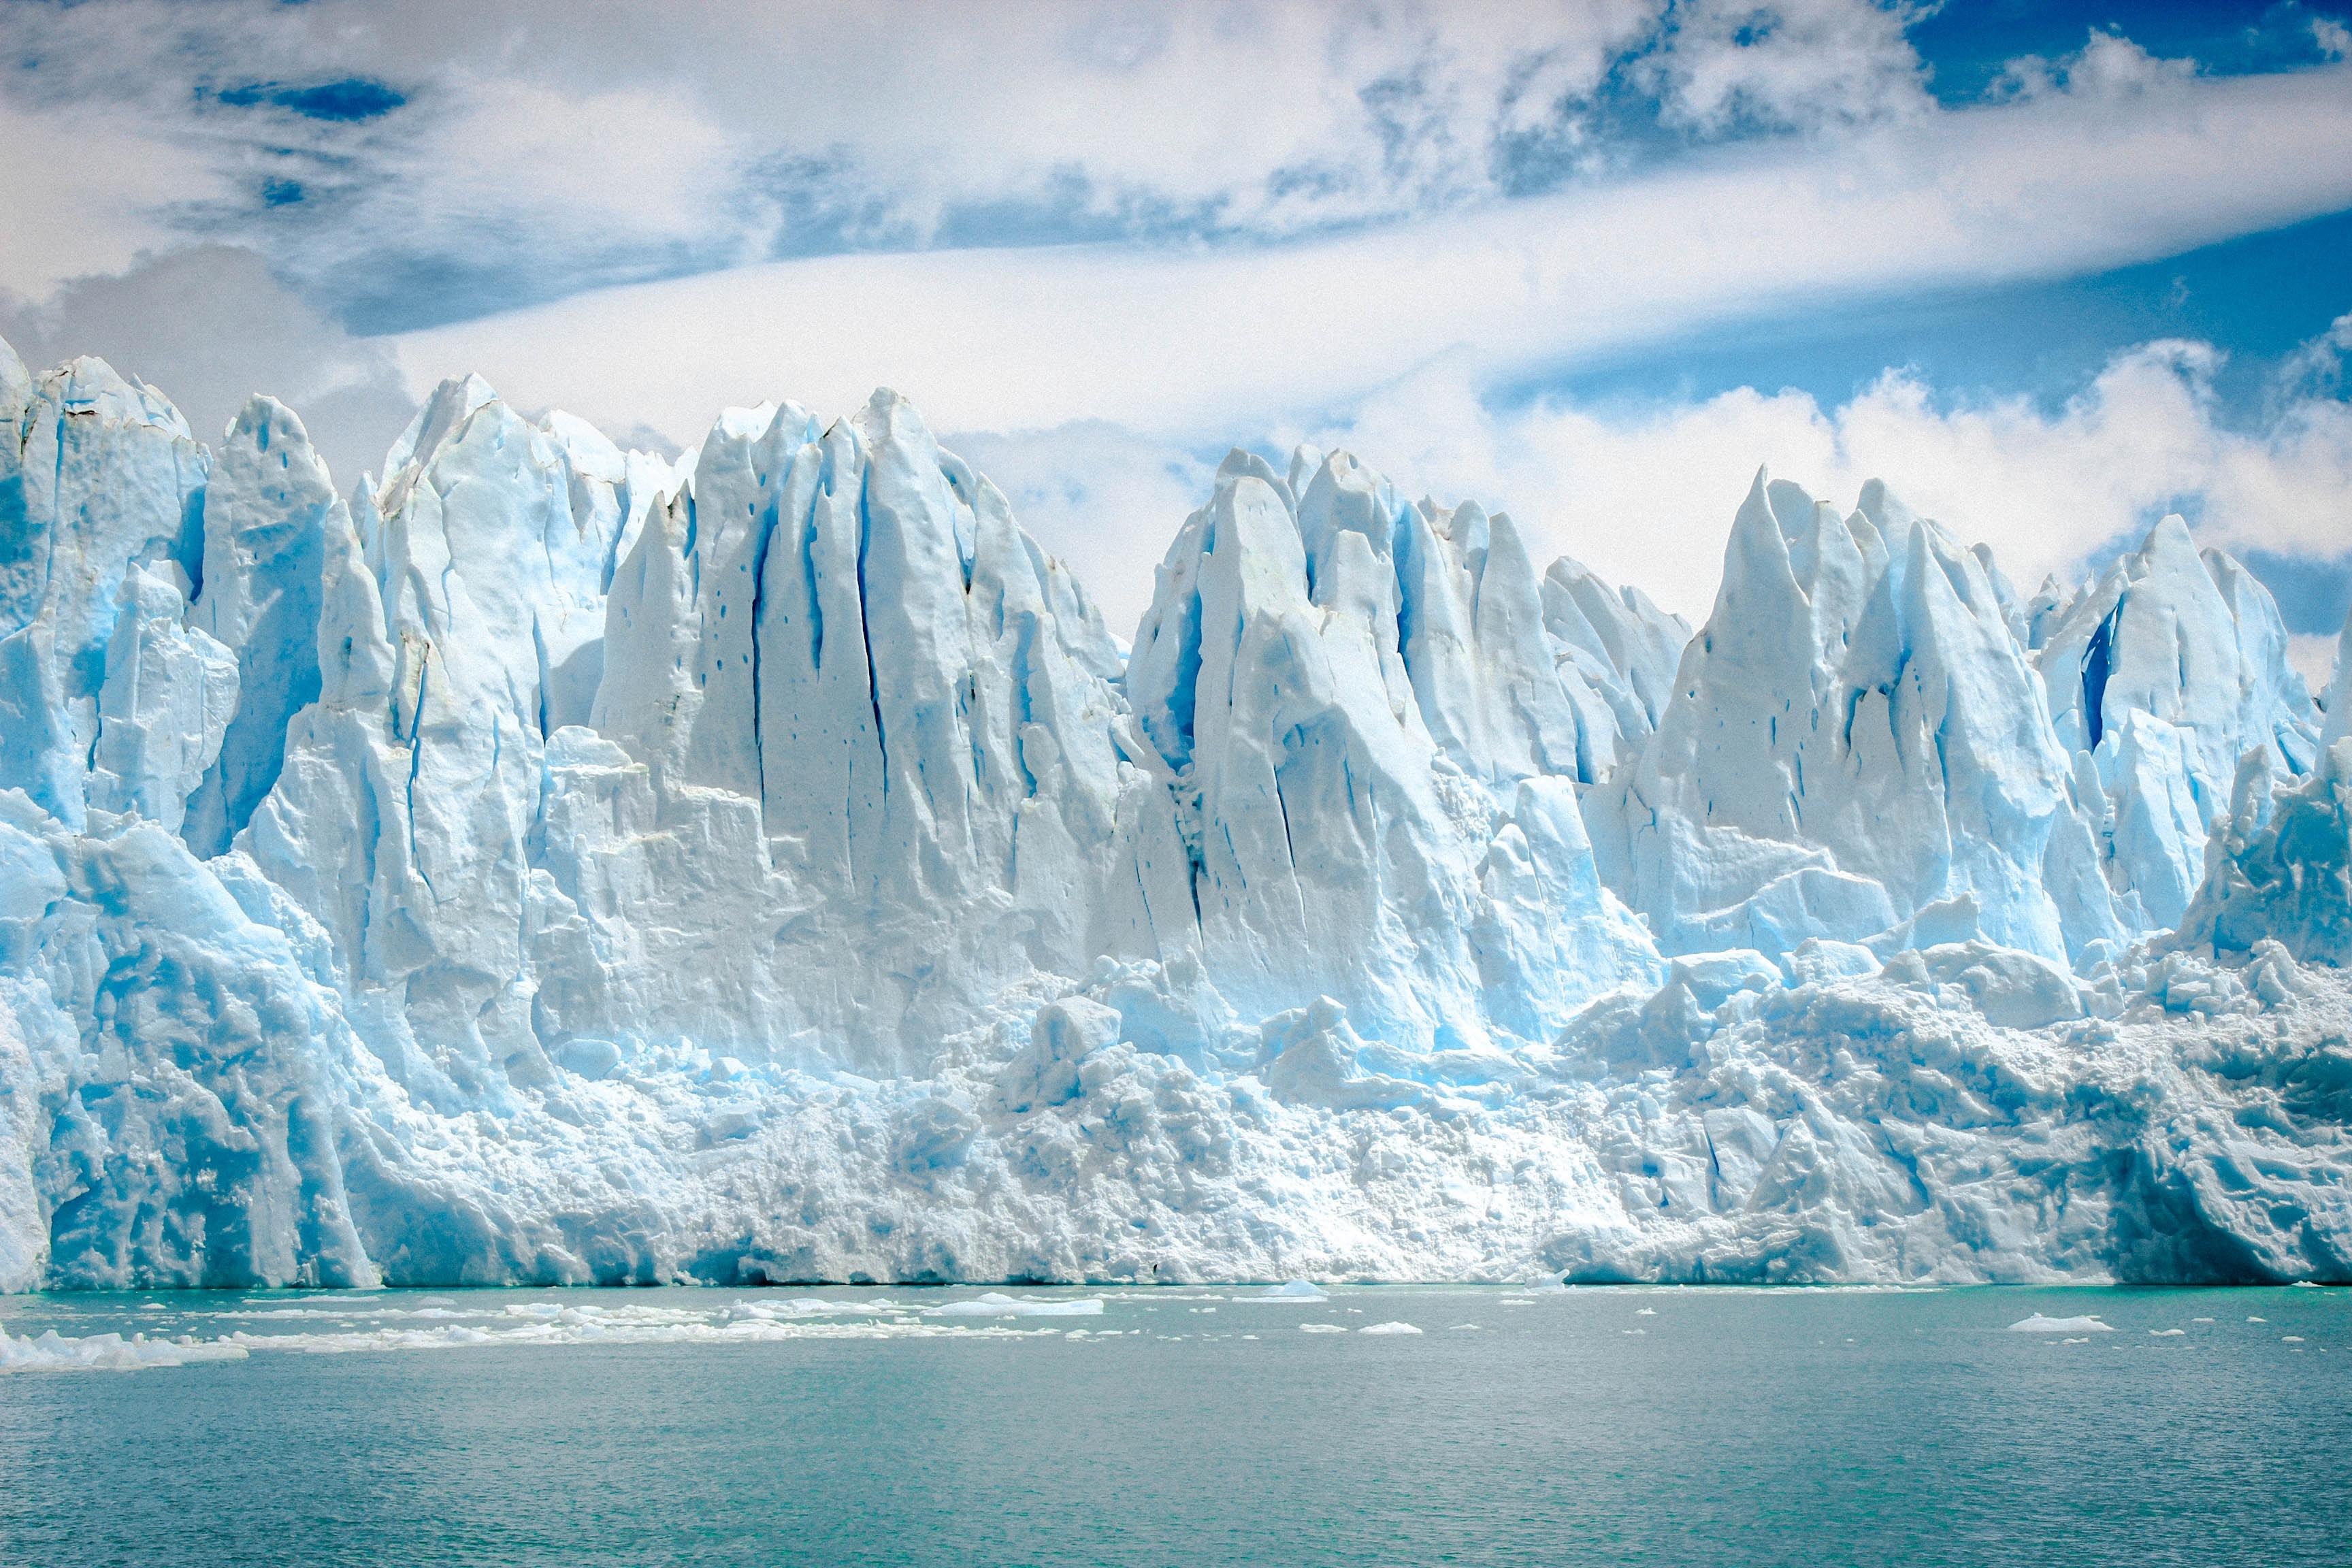 iceberg near body of water